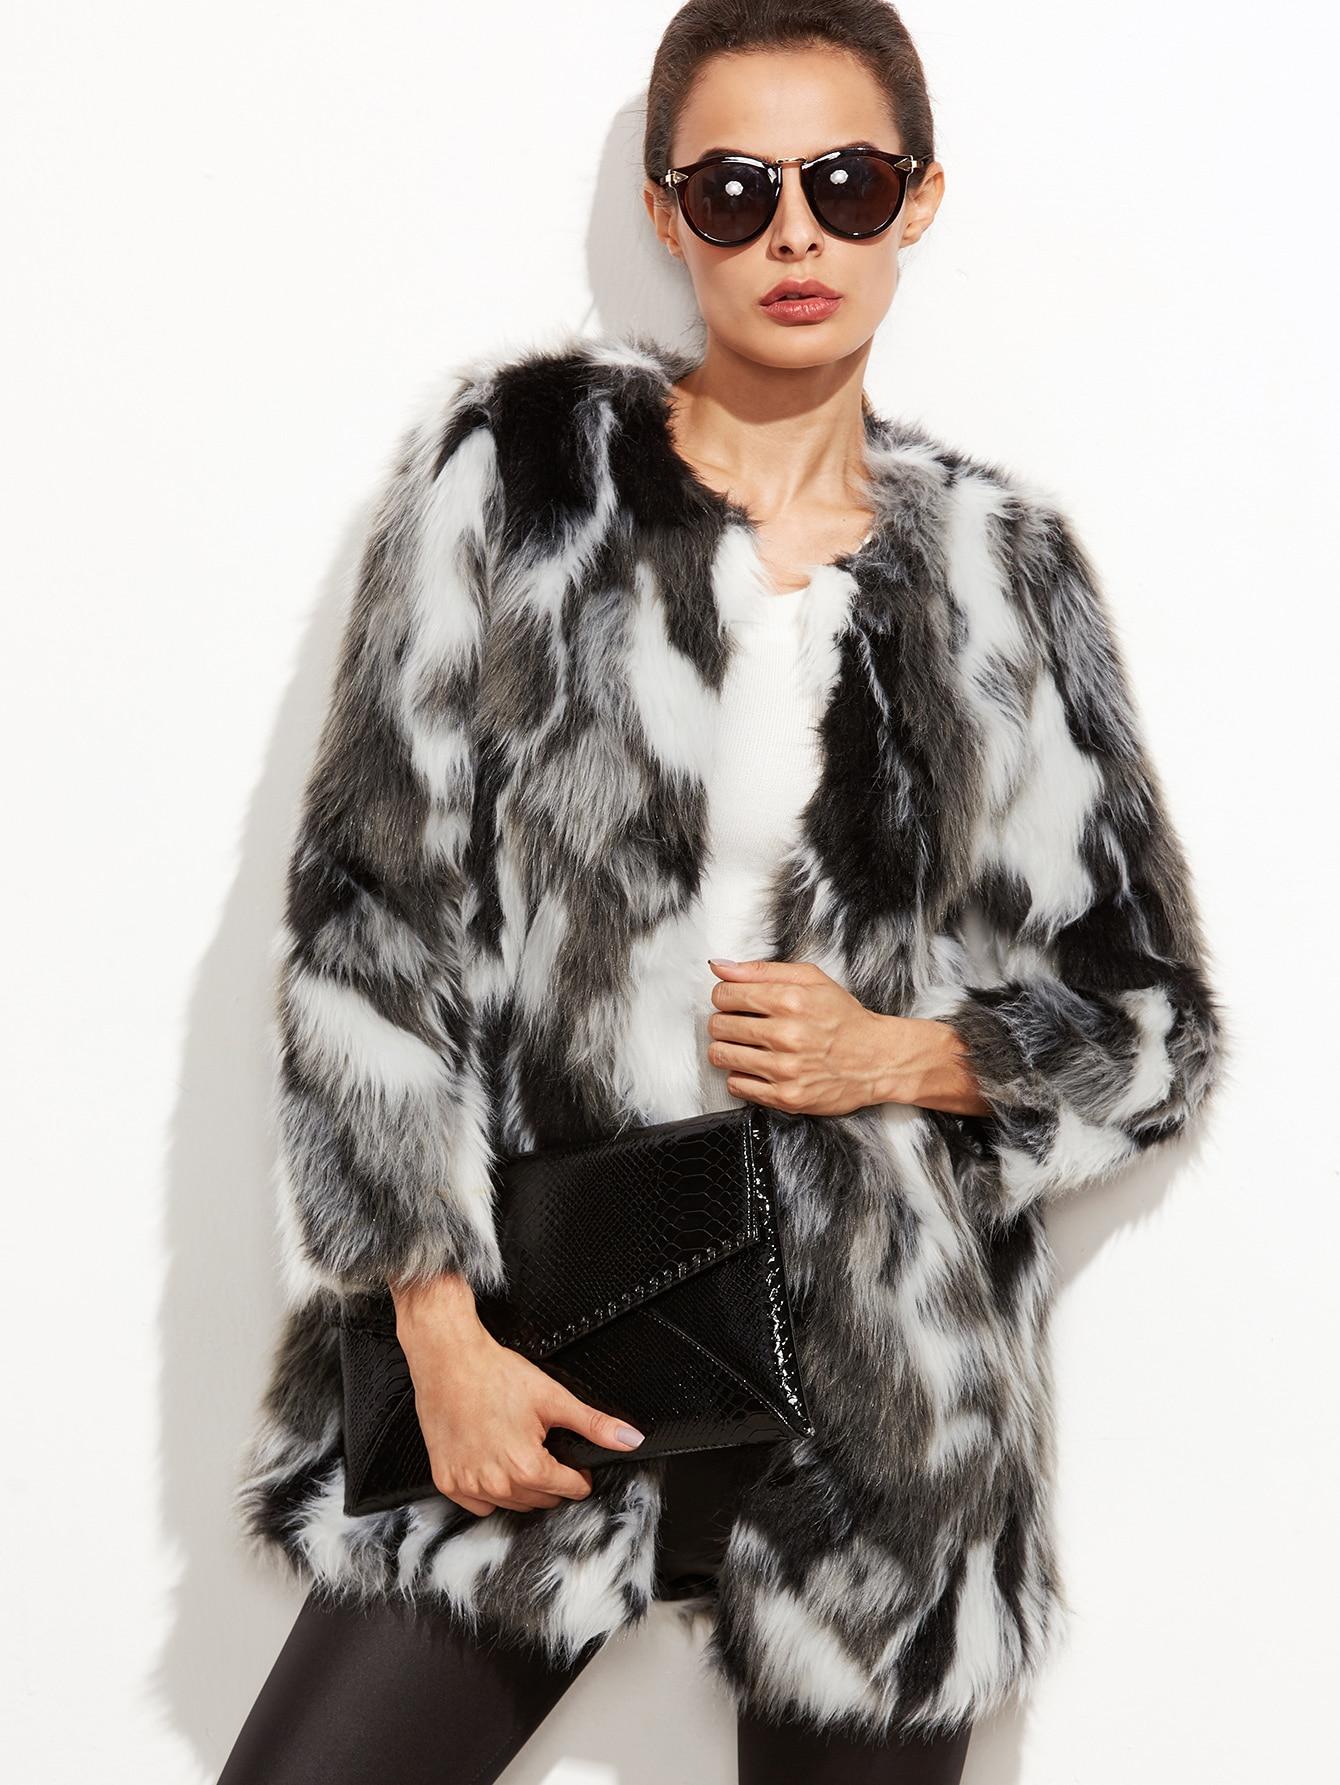 cd8c536b9cb Multicolor Faux Fur Collarless Coat EmmaCloth-Women Fast Fashion Online